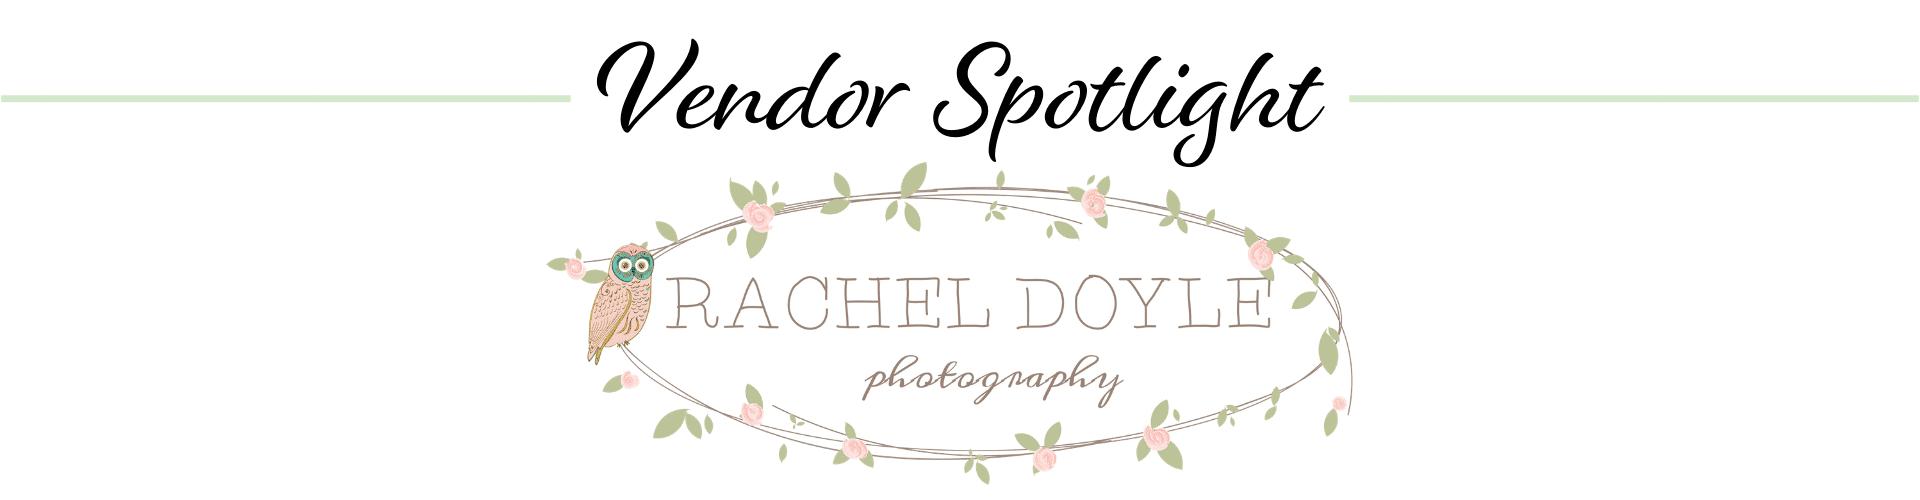 Rachel Doyle Photography logo